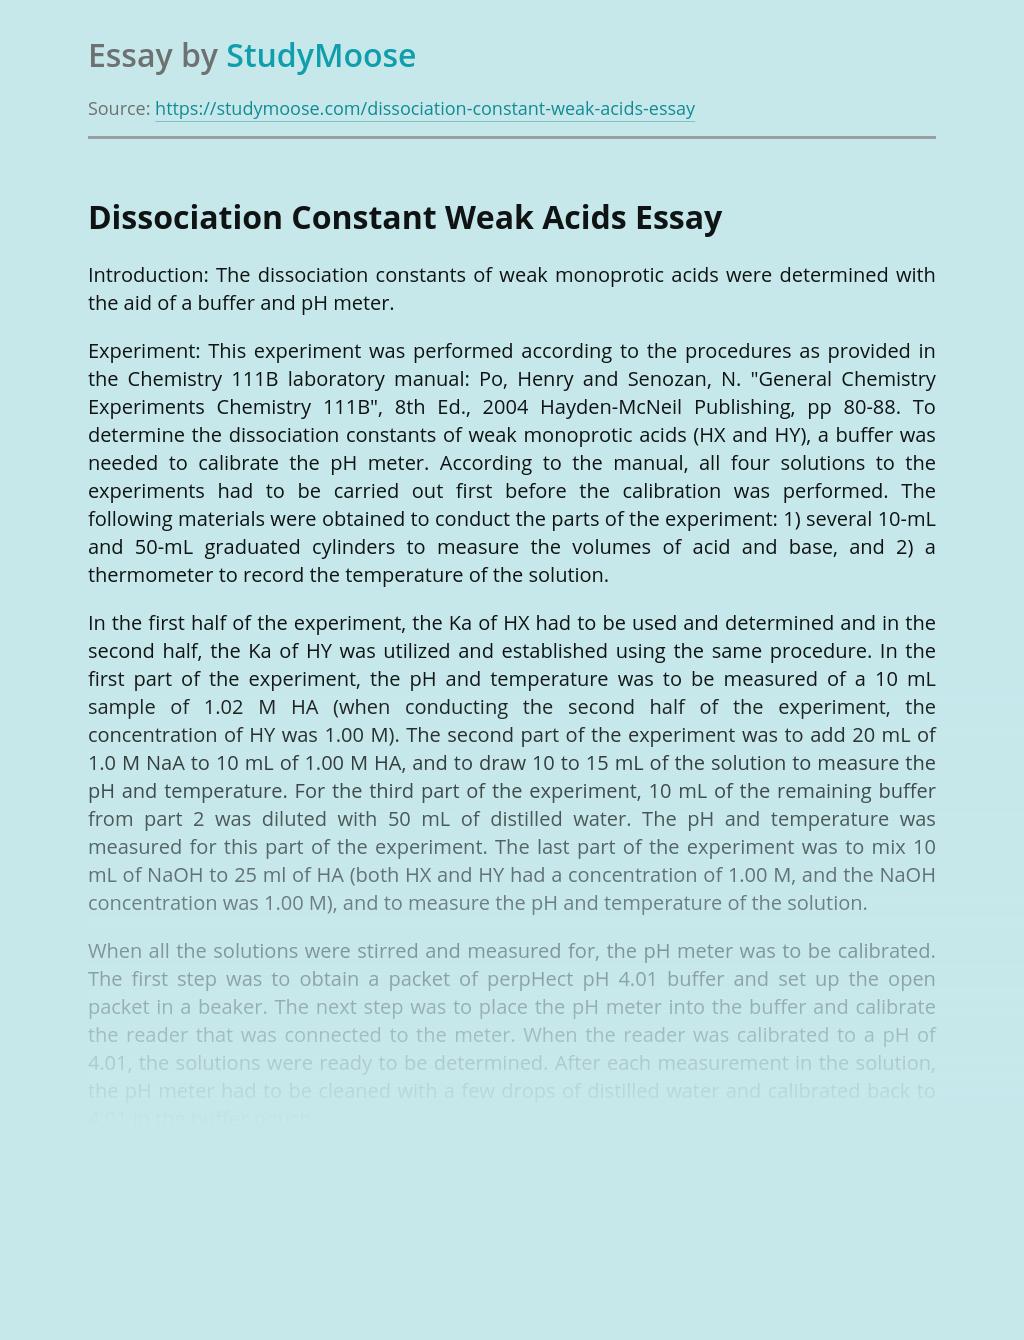 Dissociation Constant Weak Acids